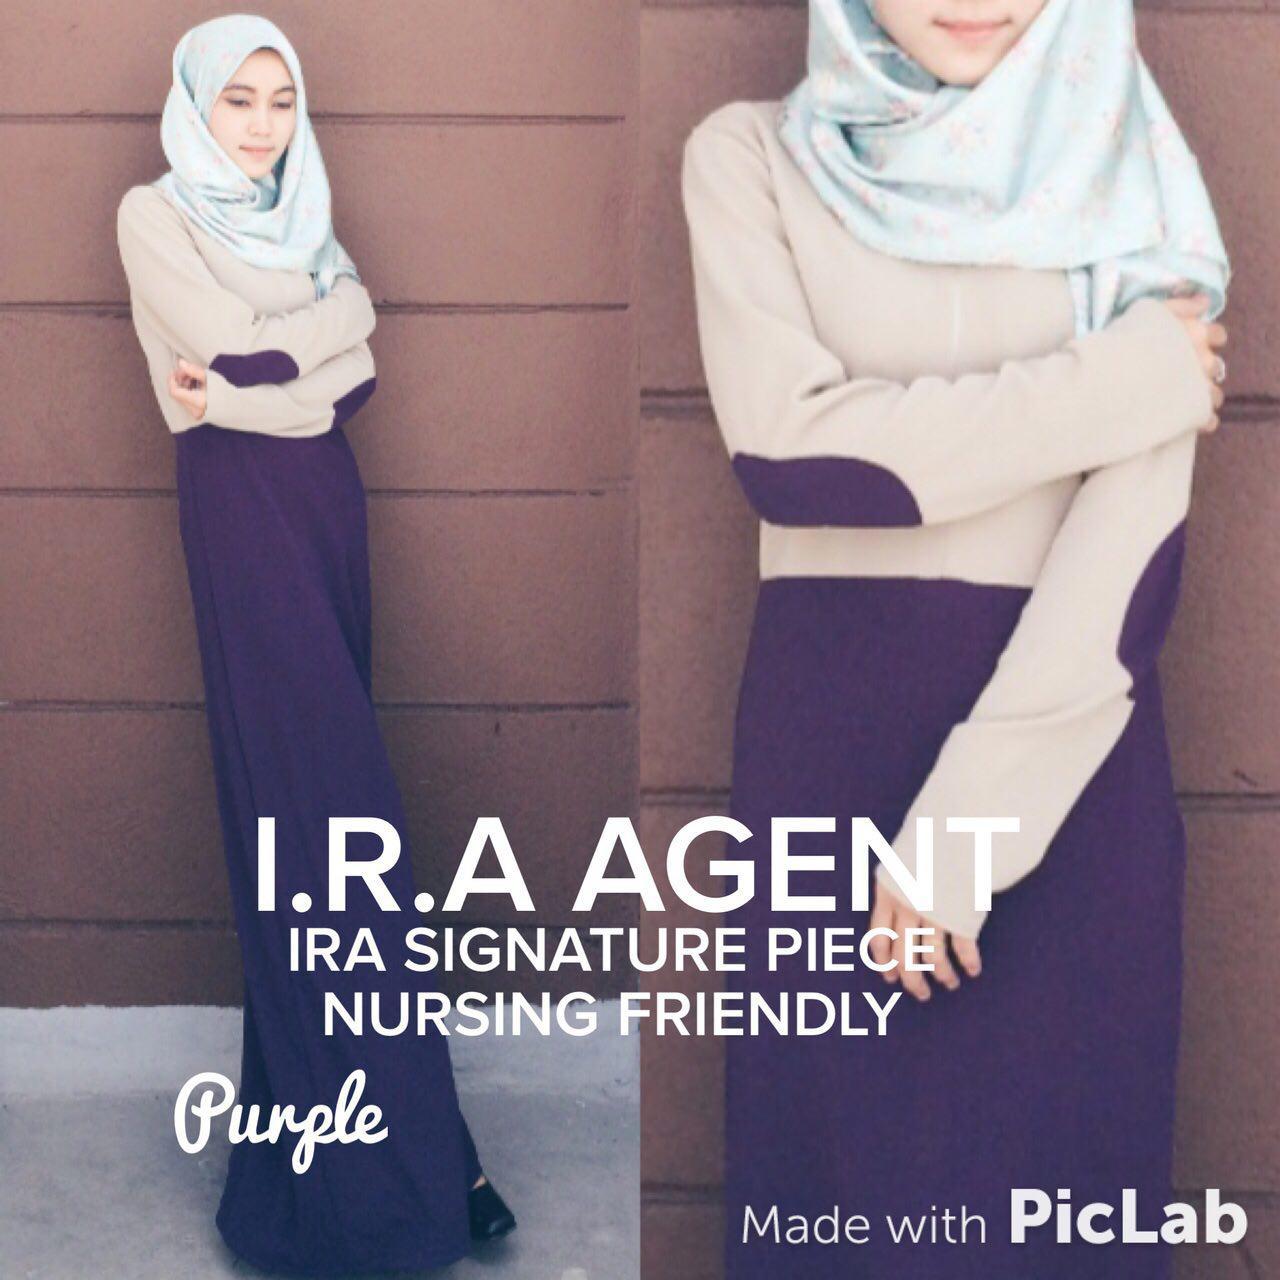 Beauty Blender Murah Dan Bagus: RESTOCK!! Ira Signature Piece Murah Giler